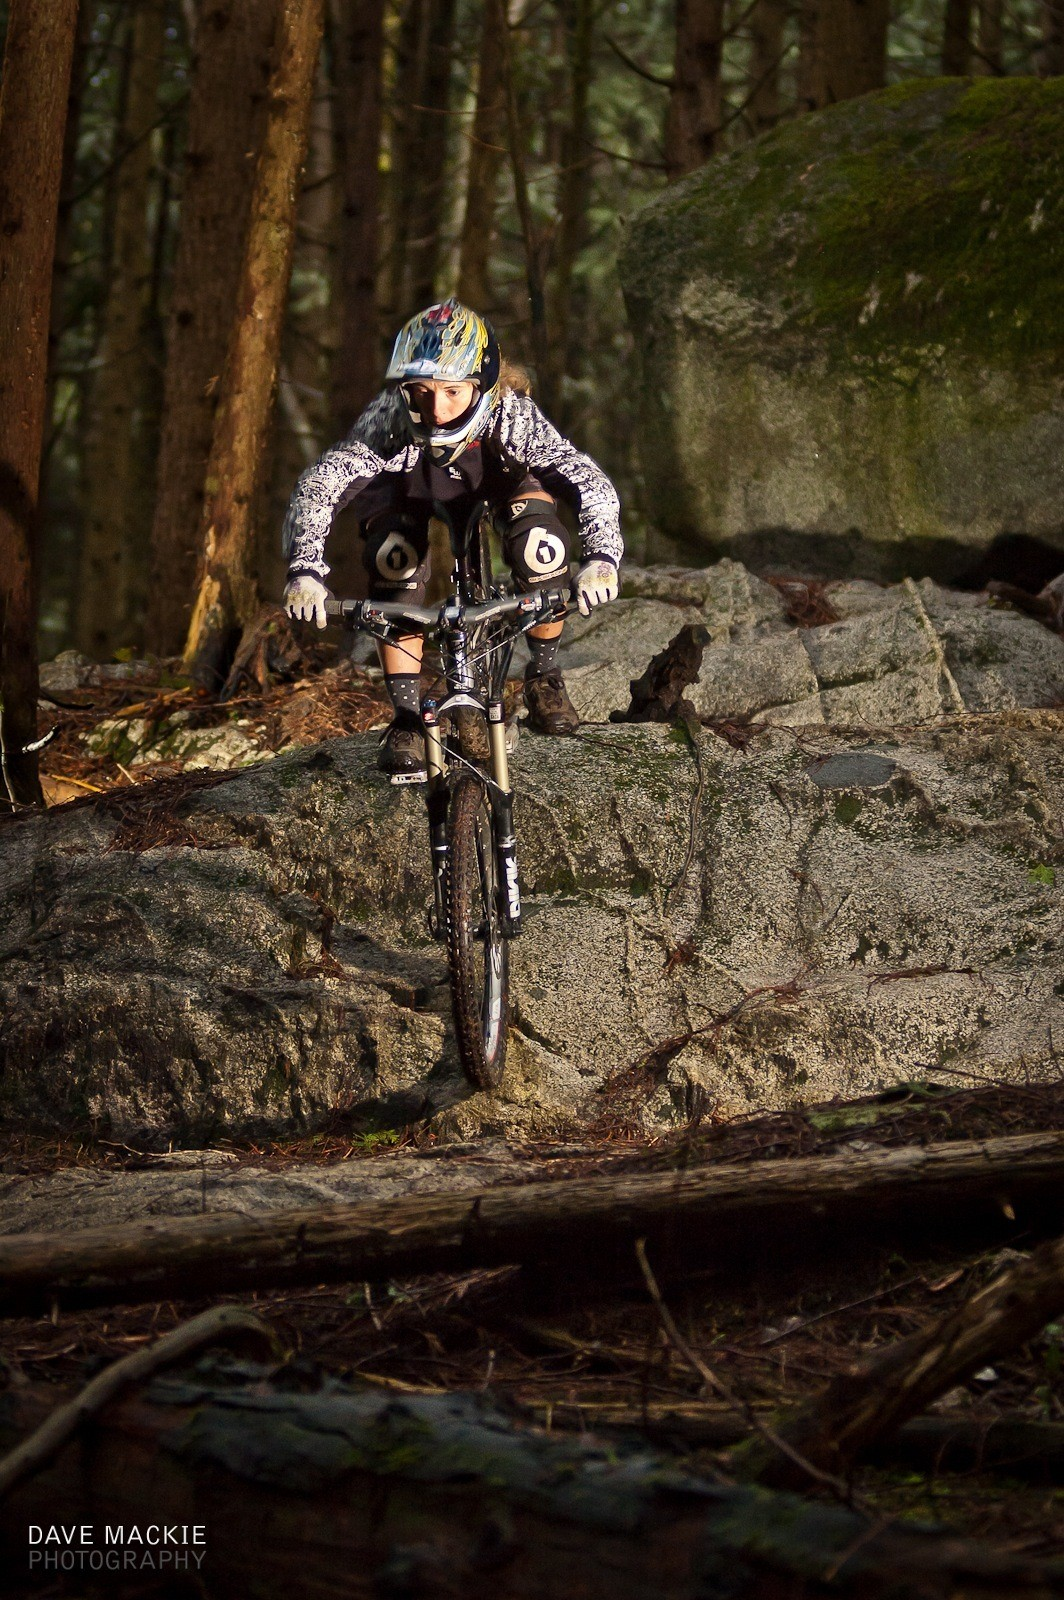 Dirty Jane 1 - sparkplug - Mountain Biking Pictures - Vital MTB